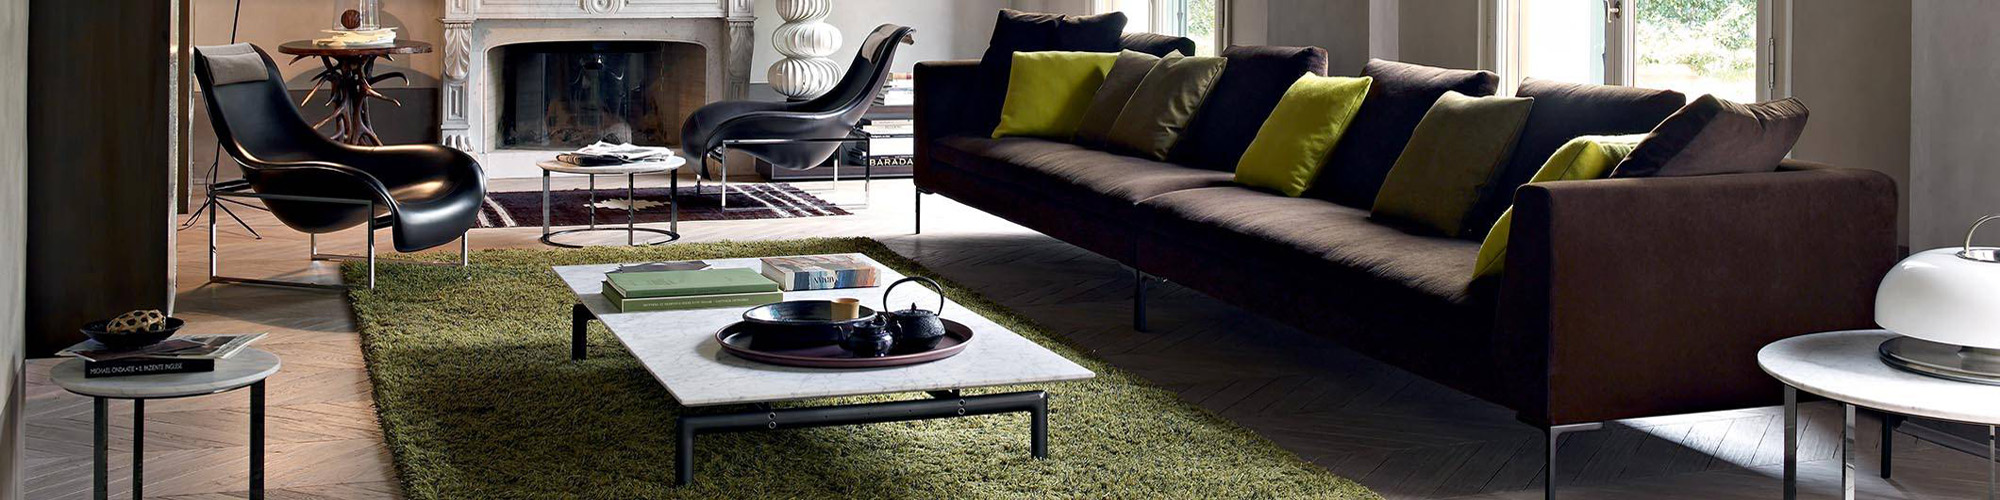 B b letti modern designer beds buy online at fci london for Letti design online